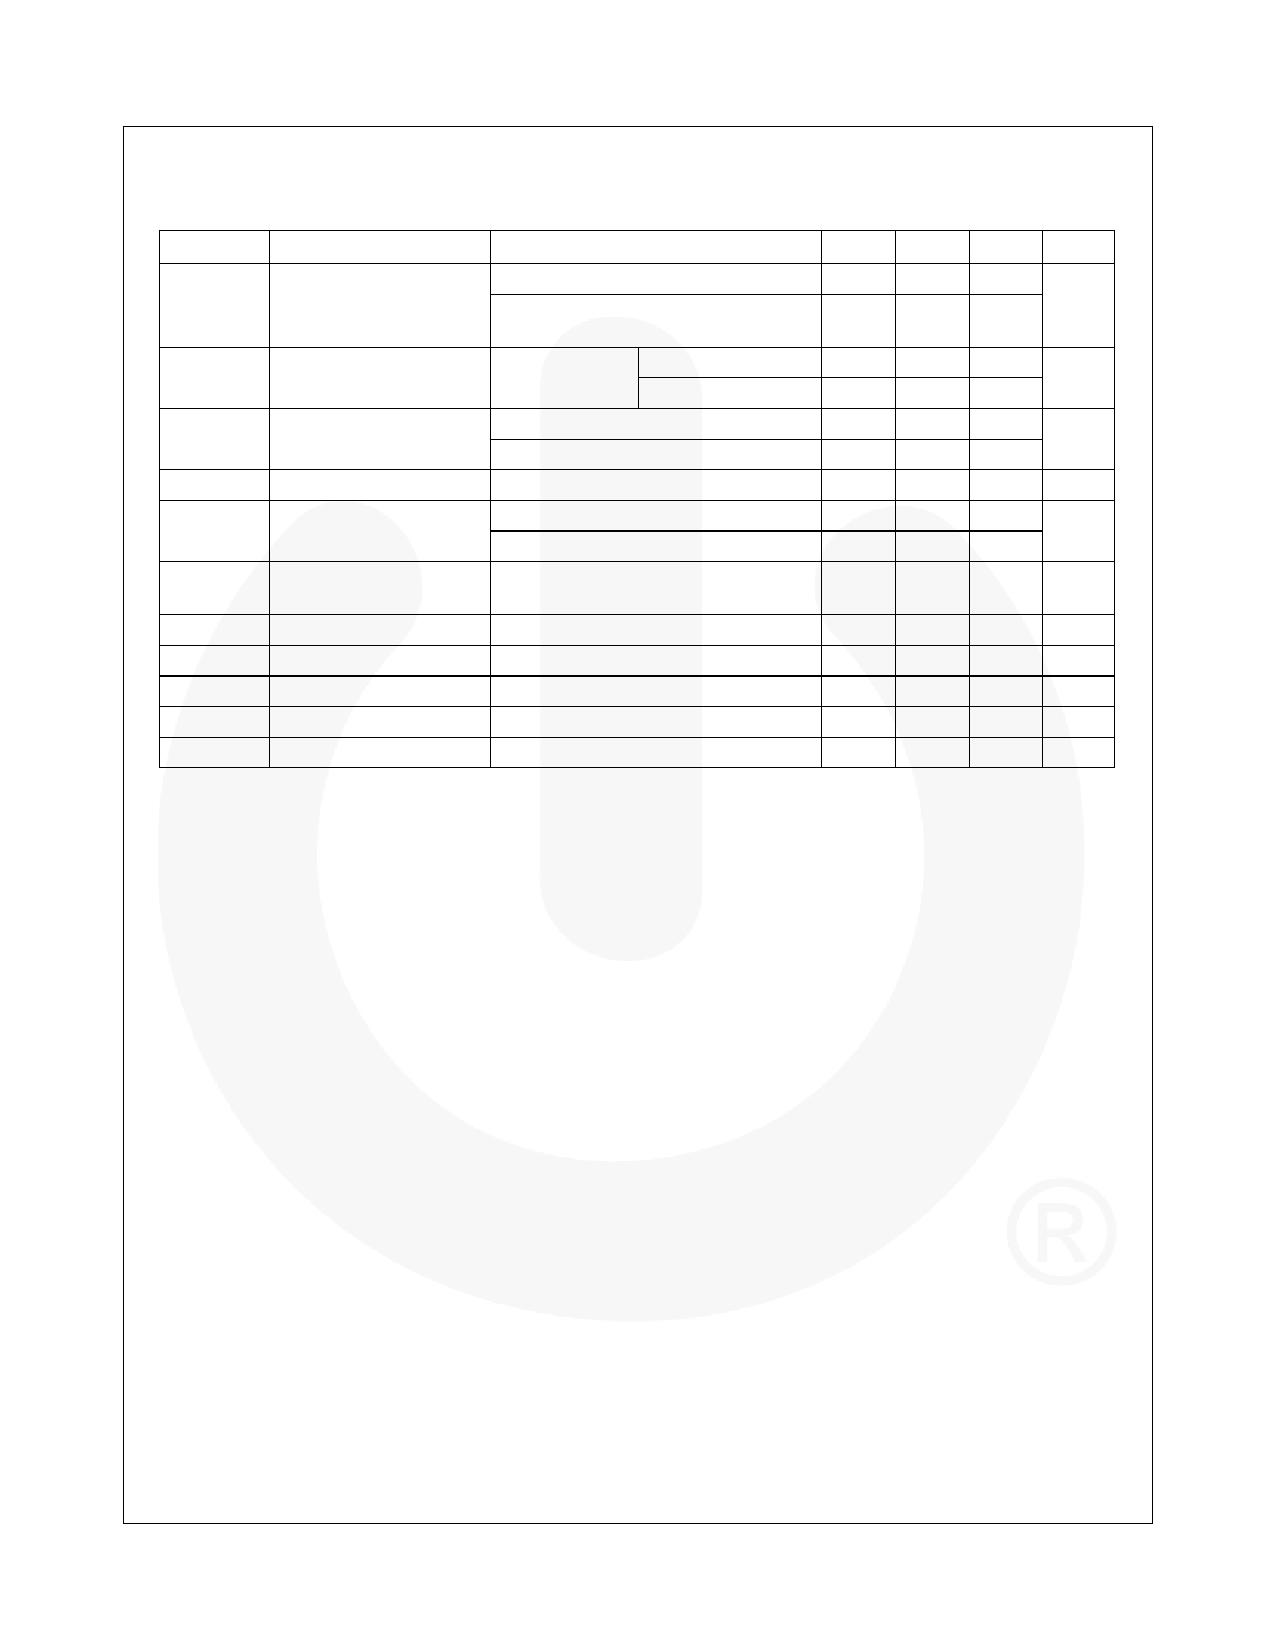 KA7912TU pdf, ピン配列